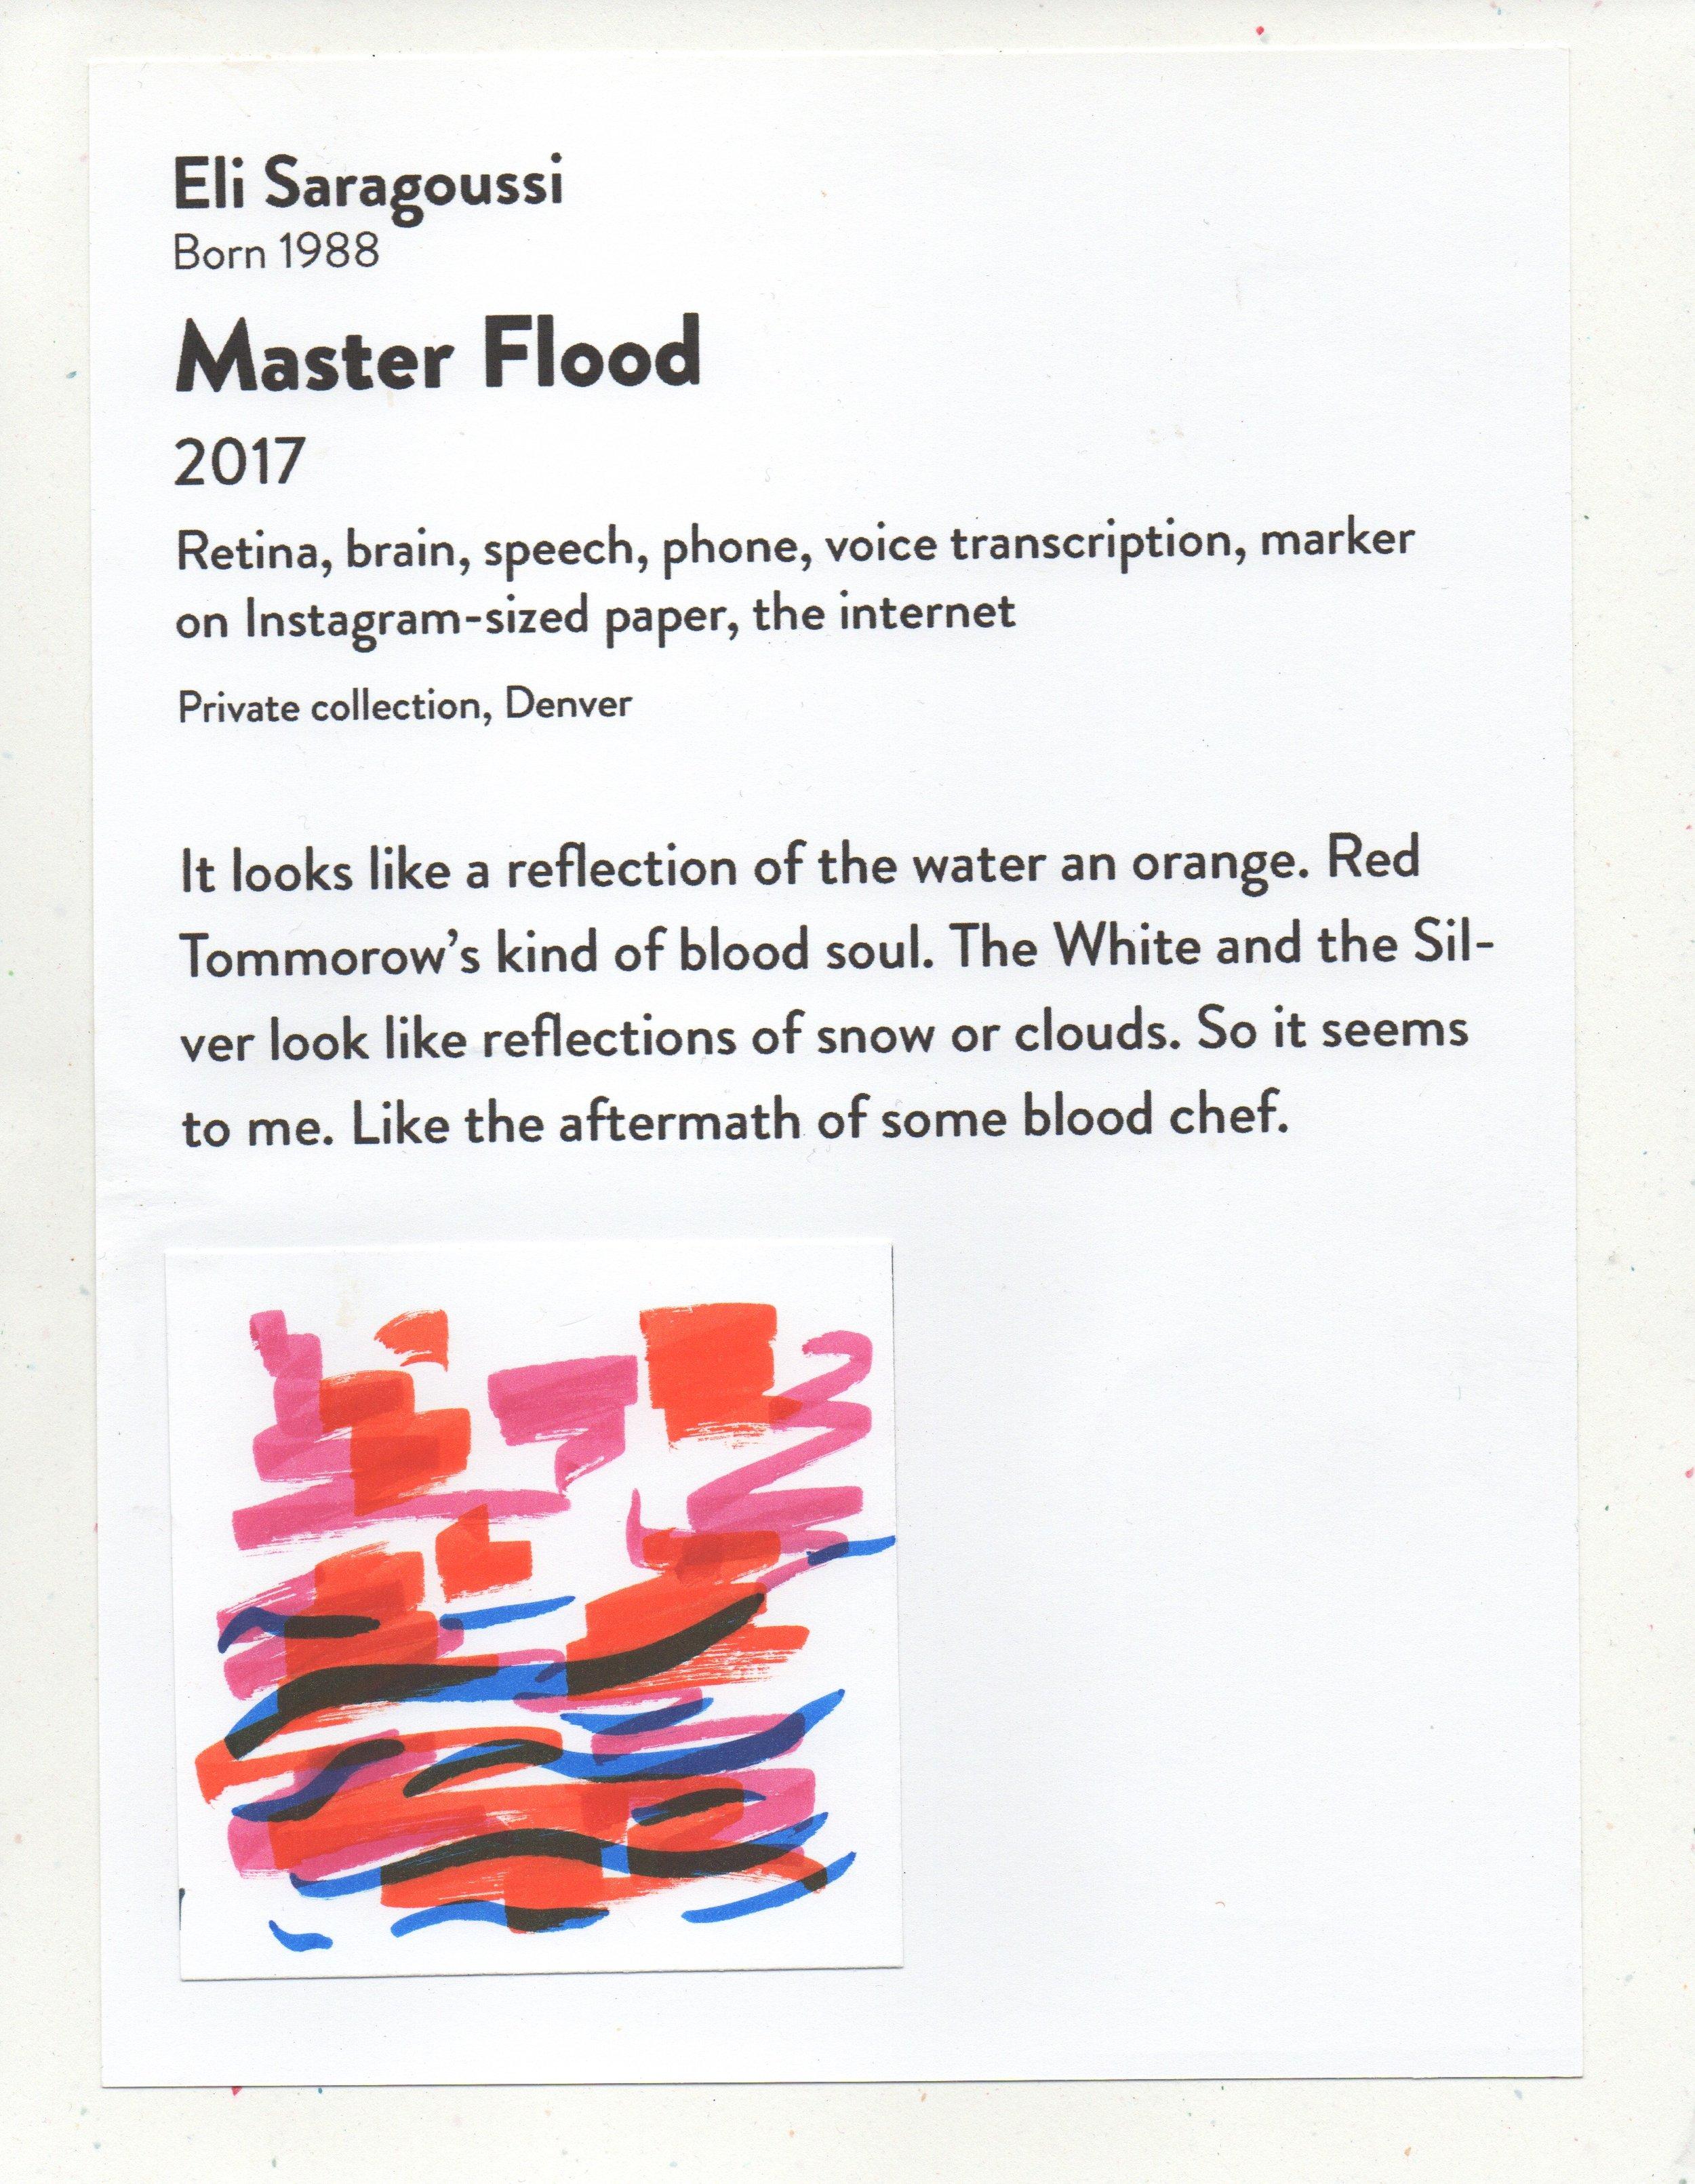 Master Flood DAM Untitled April 28, 2017.jpeg